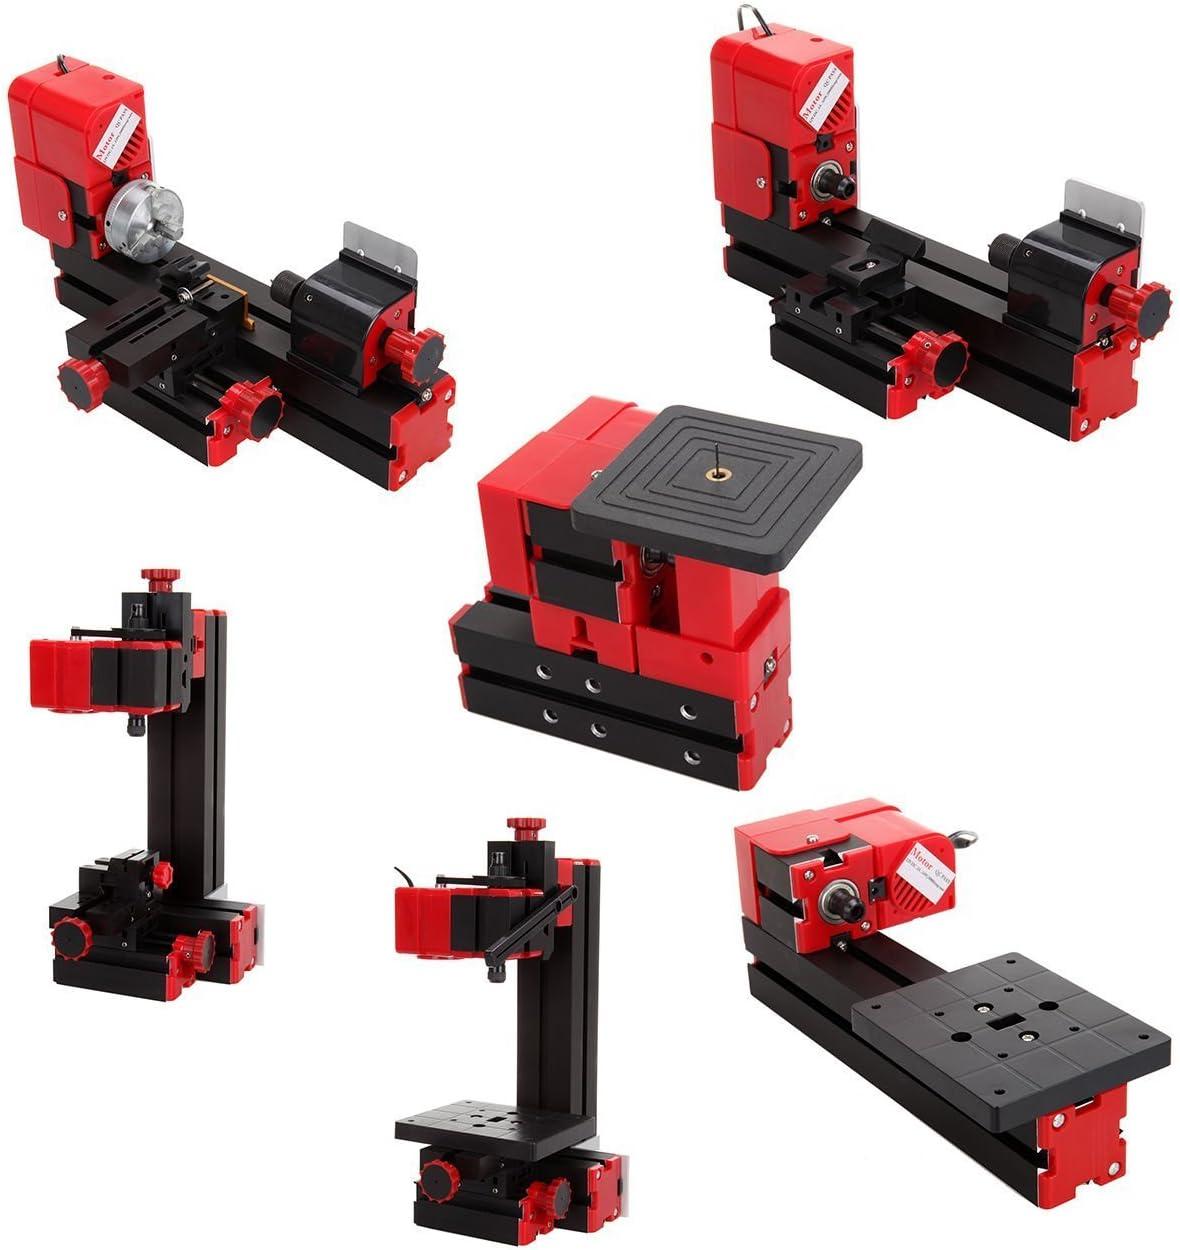 Iglobalbuy Mini Max 40% OFF Multipurpose Machine All items free shipping 6 In Kit Wood 1 Soft Metal